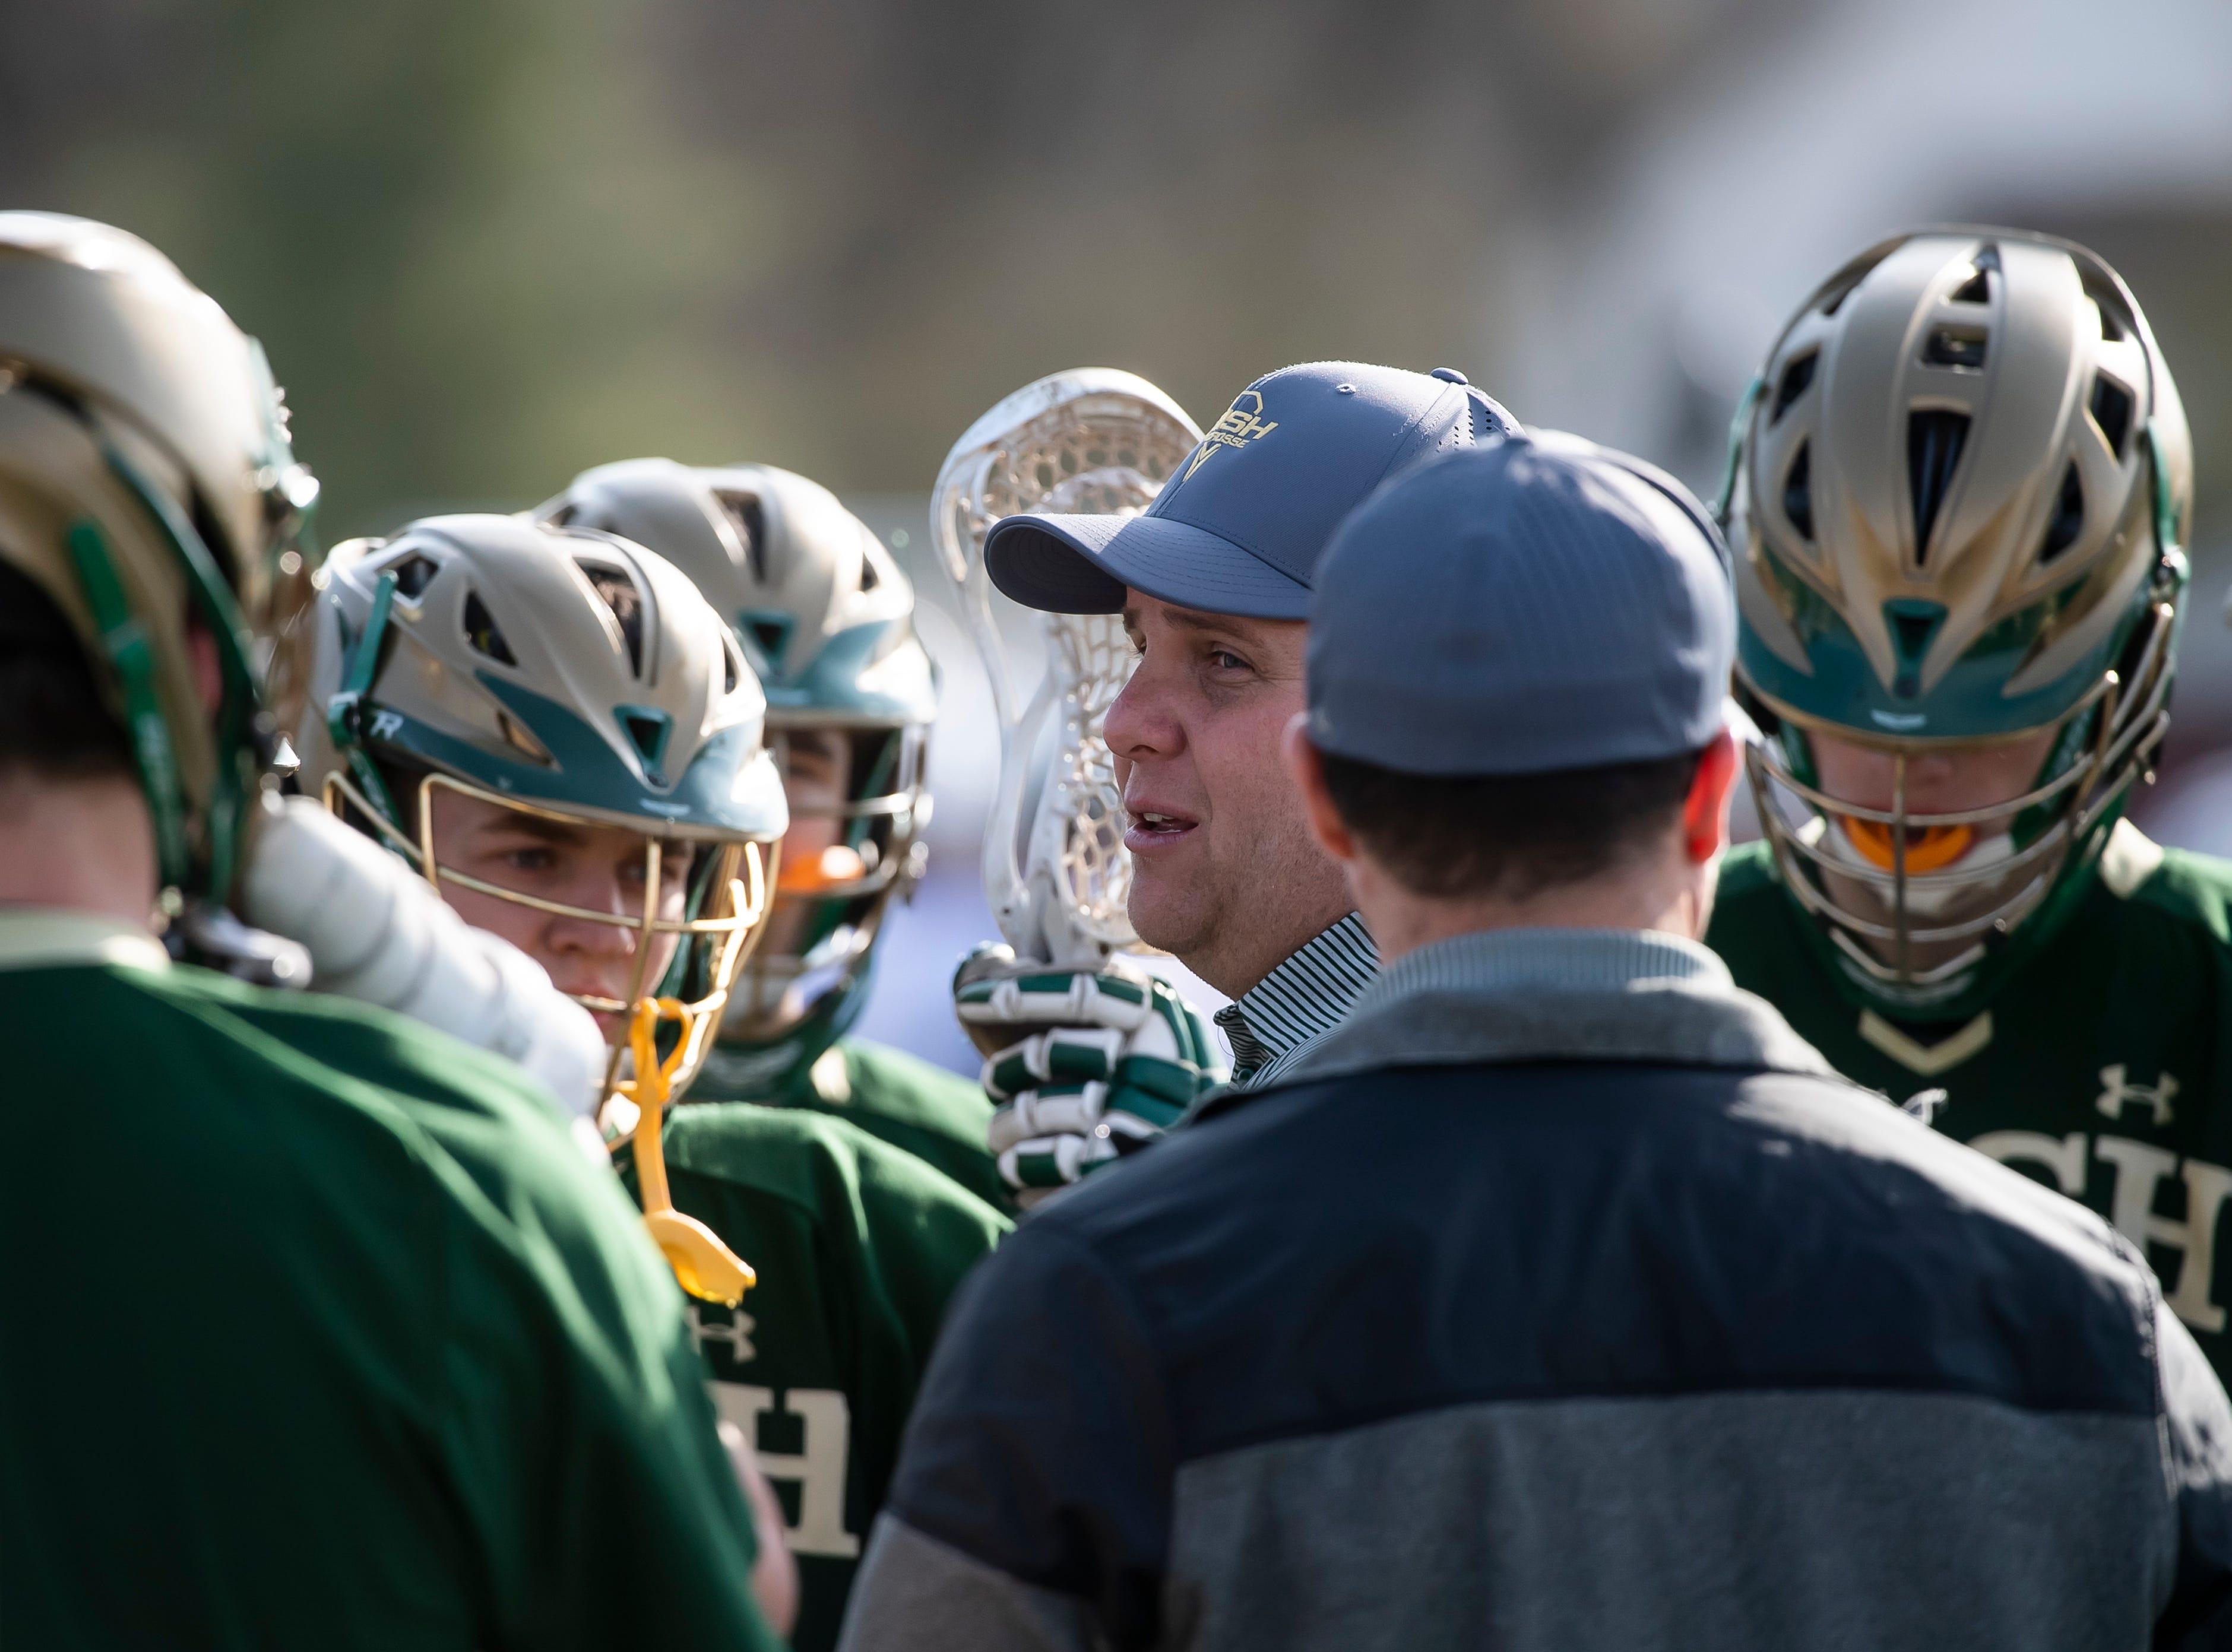 York Catholic boys lacrosse head coach Shane Harper speaks with his team during a YAIAA game against New Oxford on Thursday, April 4, 2019. York Catholic won 14-8.